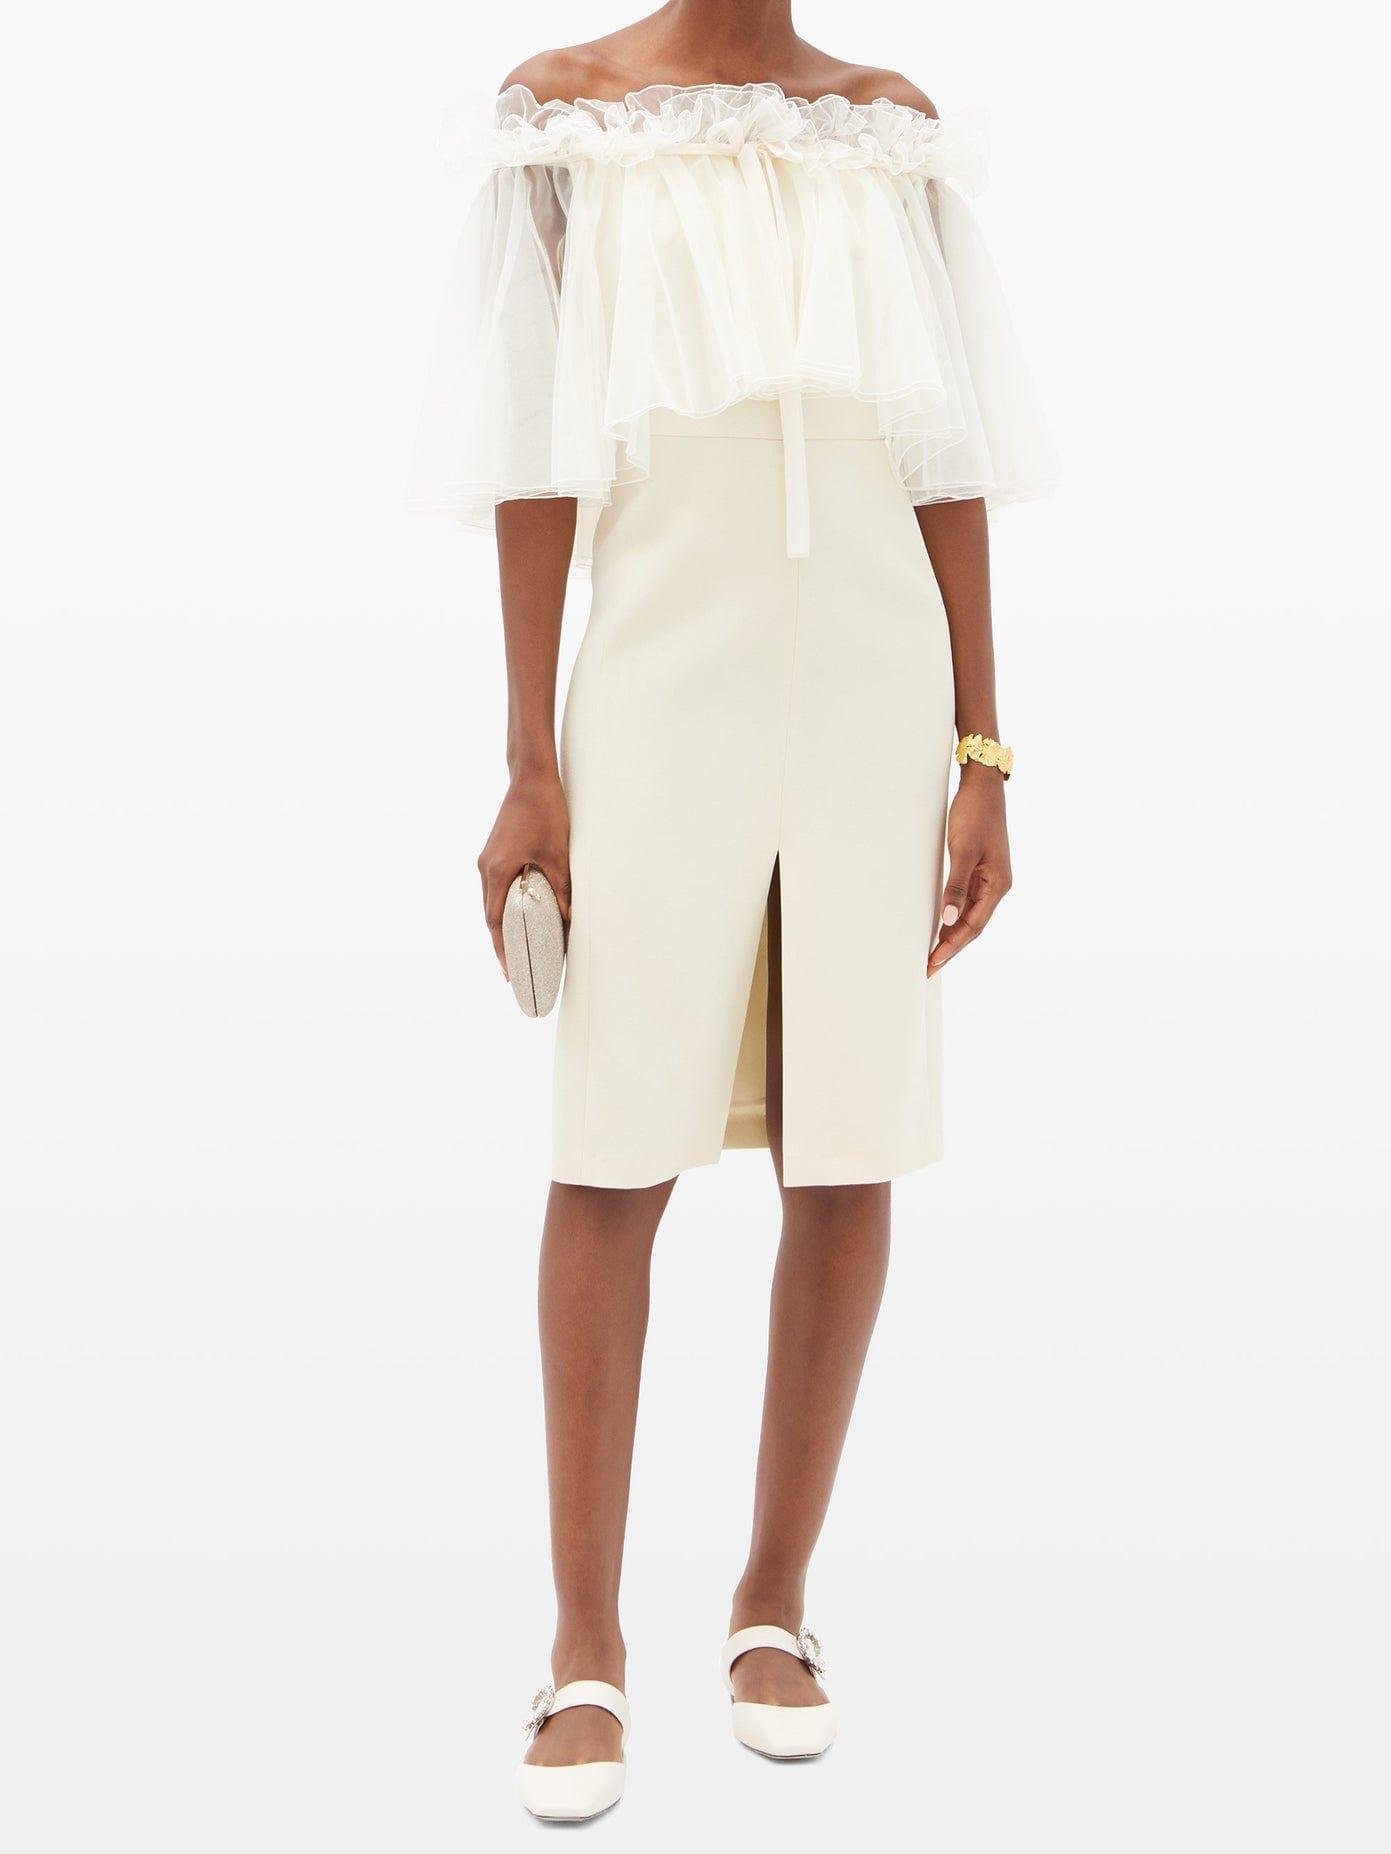 GIAMBATTISTA VALLI Off-the-shoulder Ruffled Cady Dress